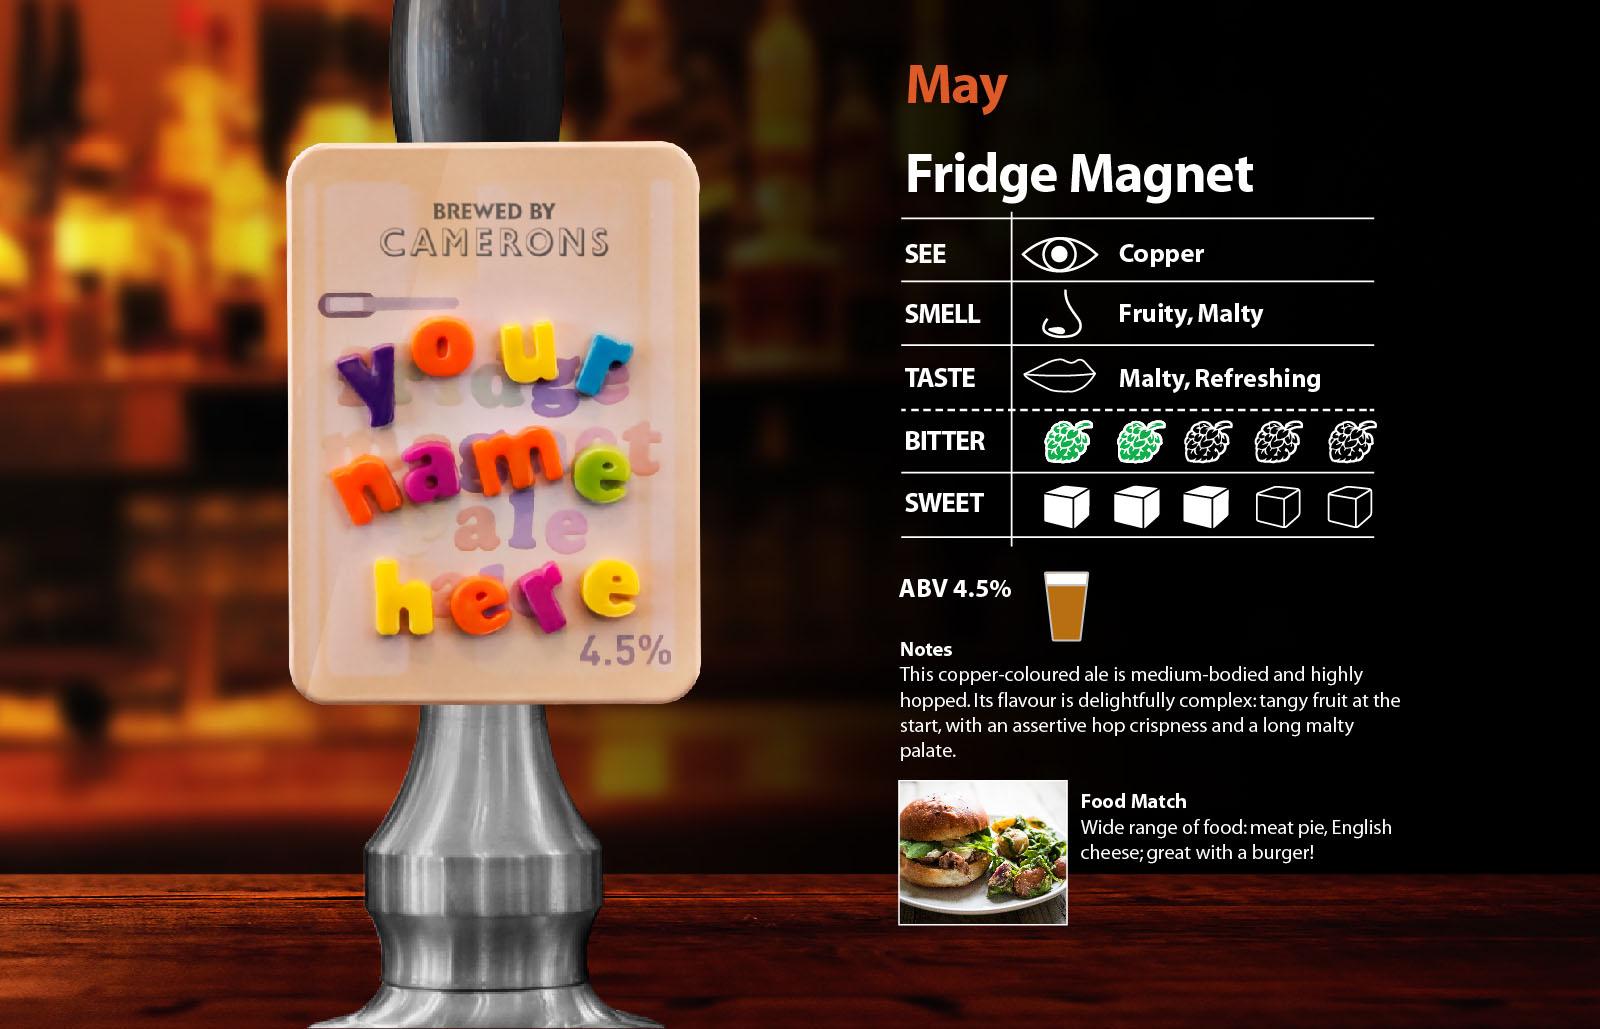 10-MAY-FRIDGE-MAGNET